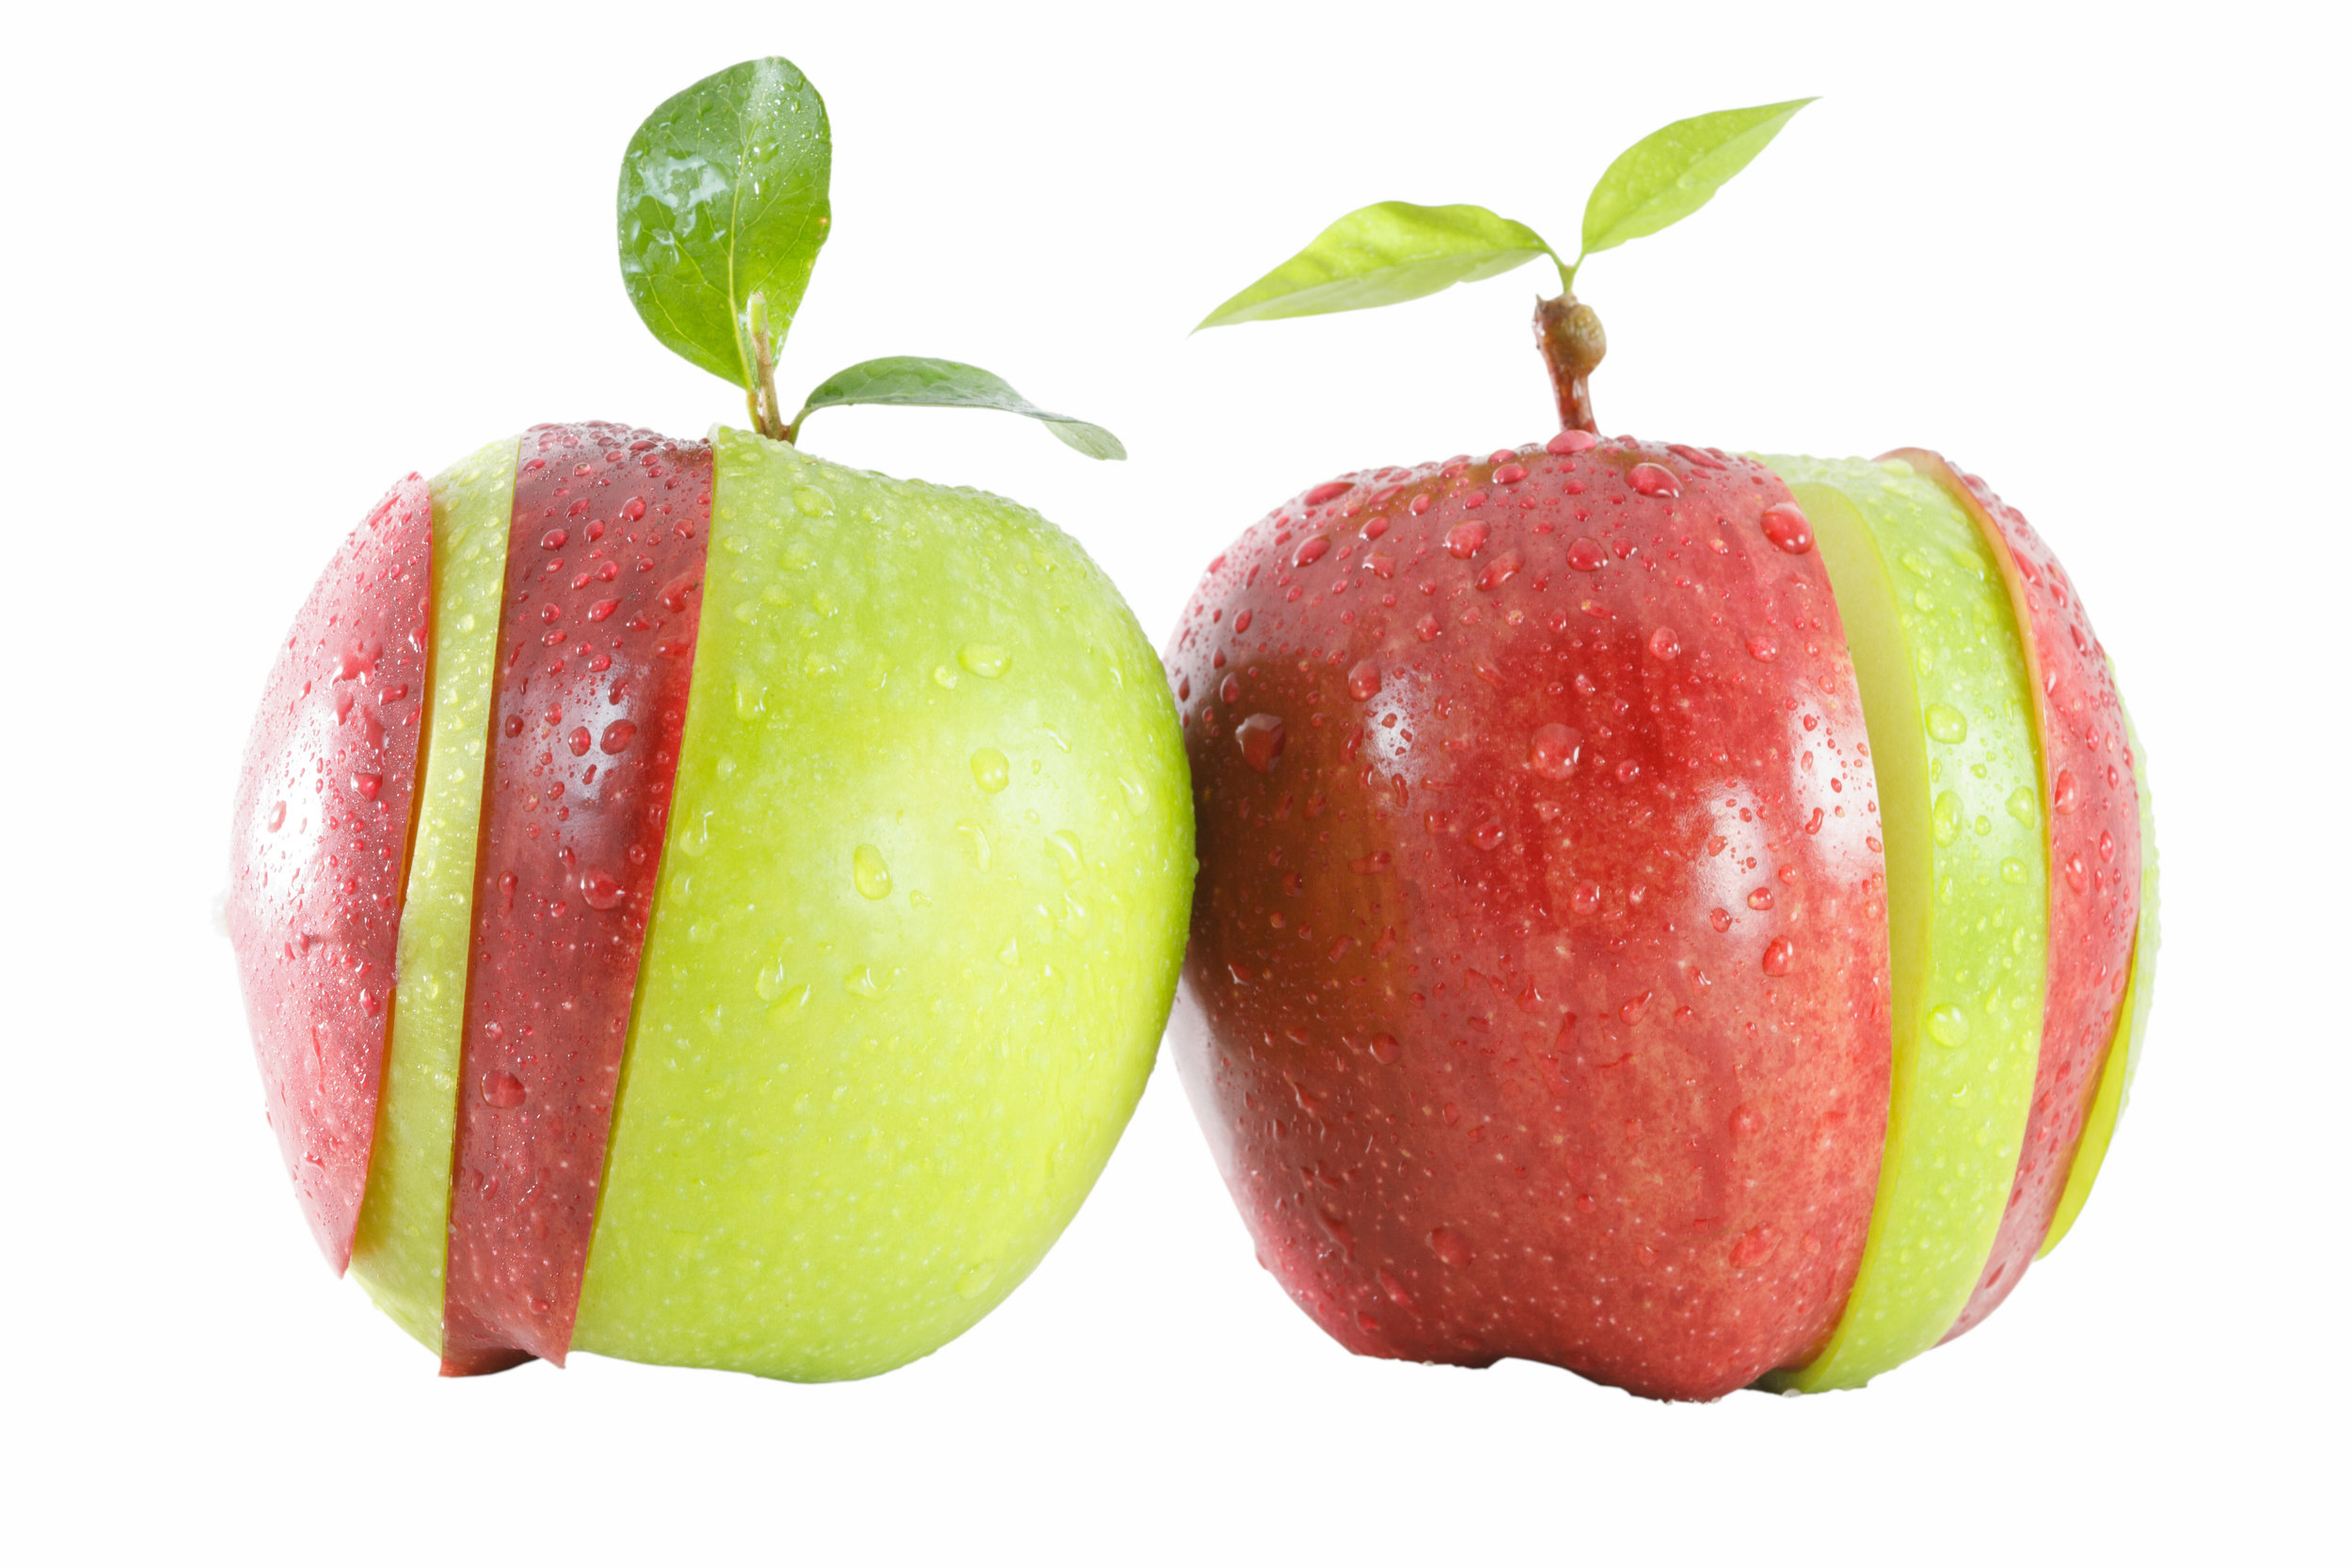 cut apples.jpg